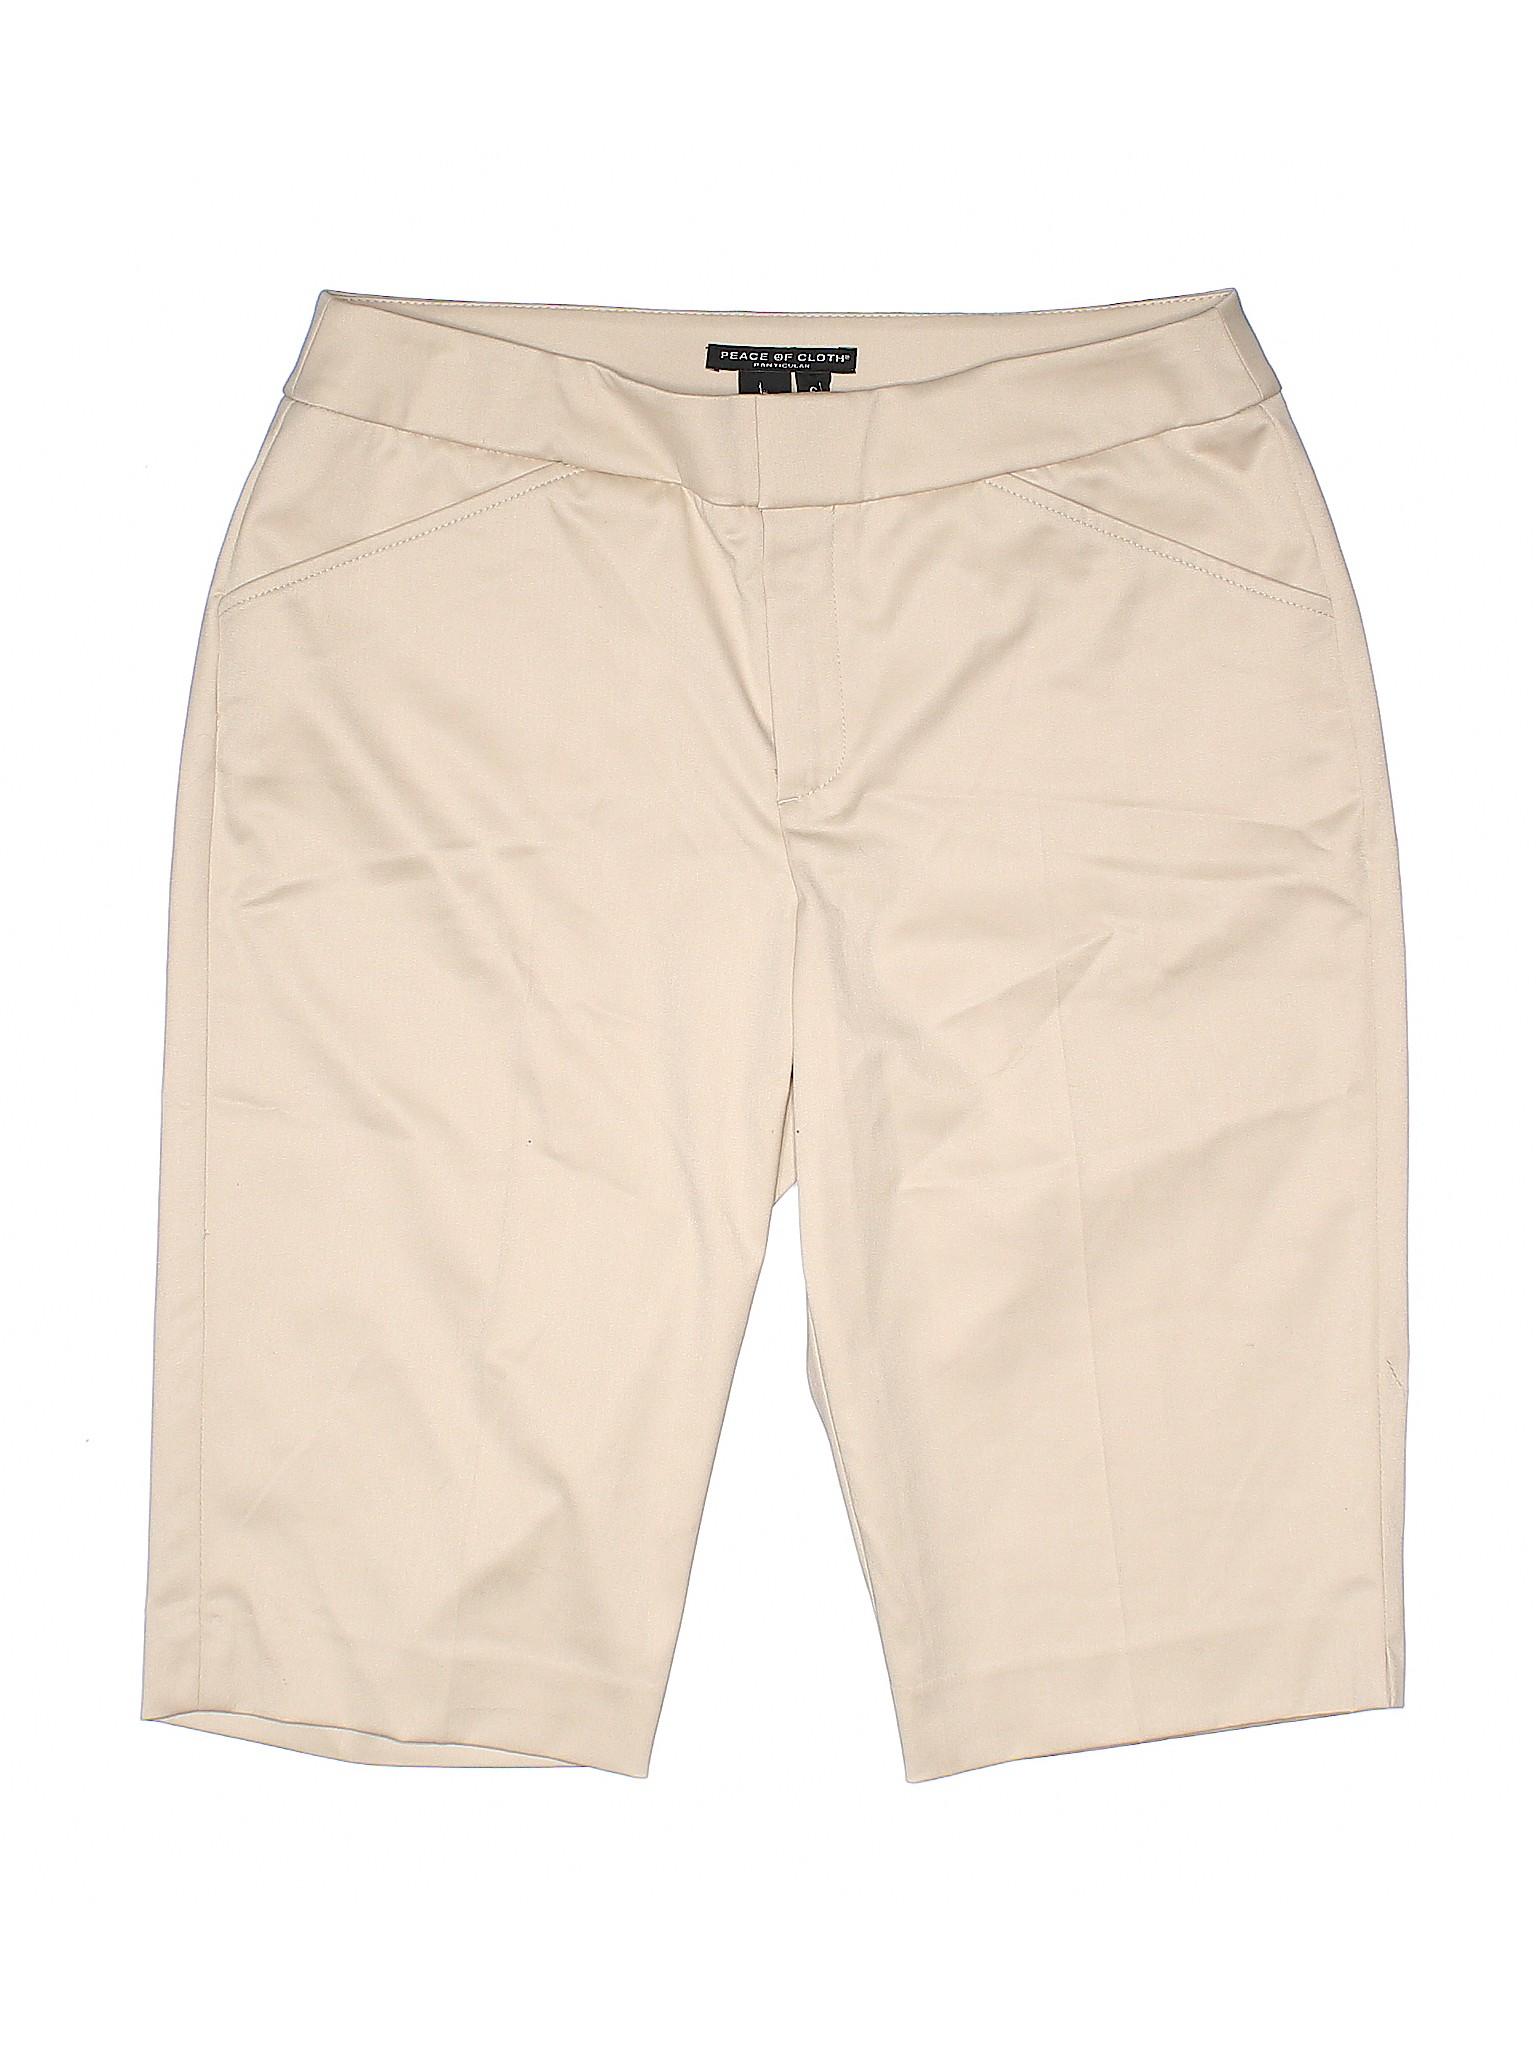 of Cloth Shorts Khaki Peace Boutique qXgSxT1